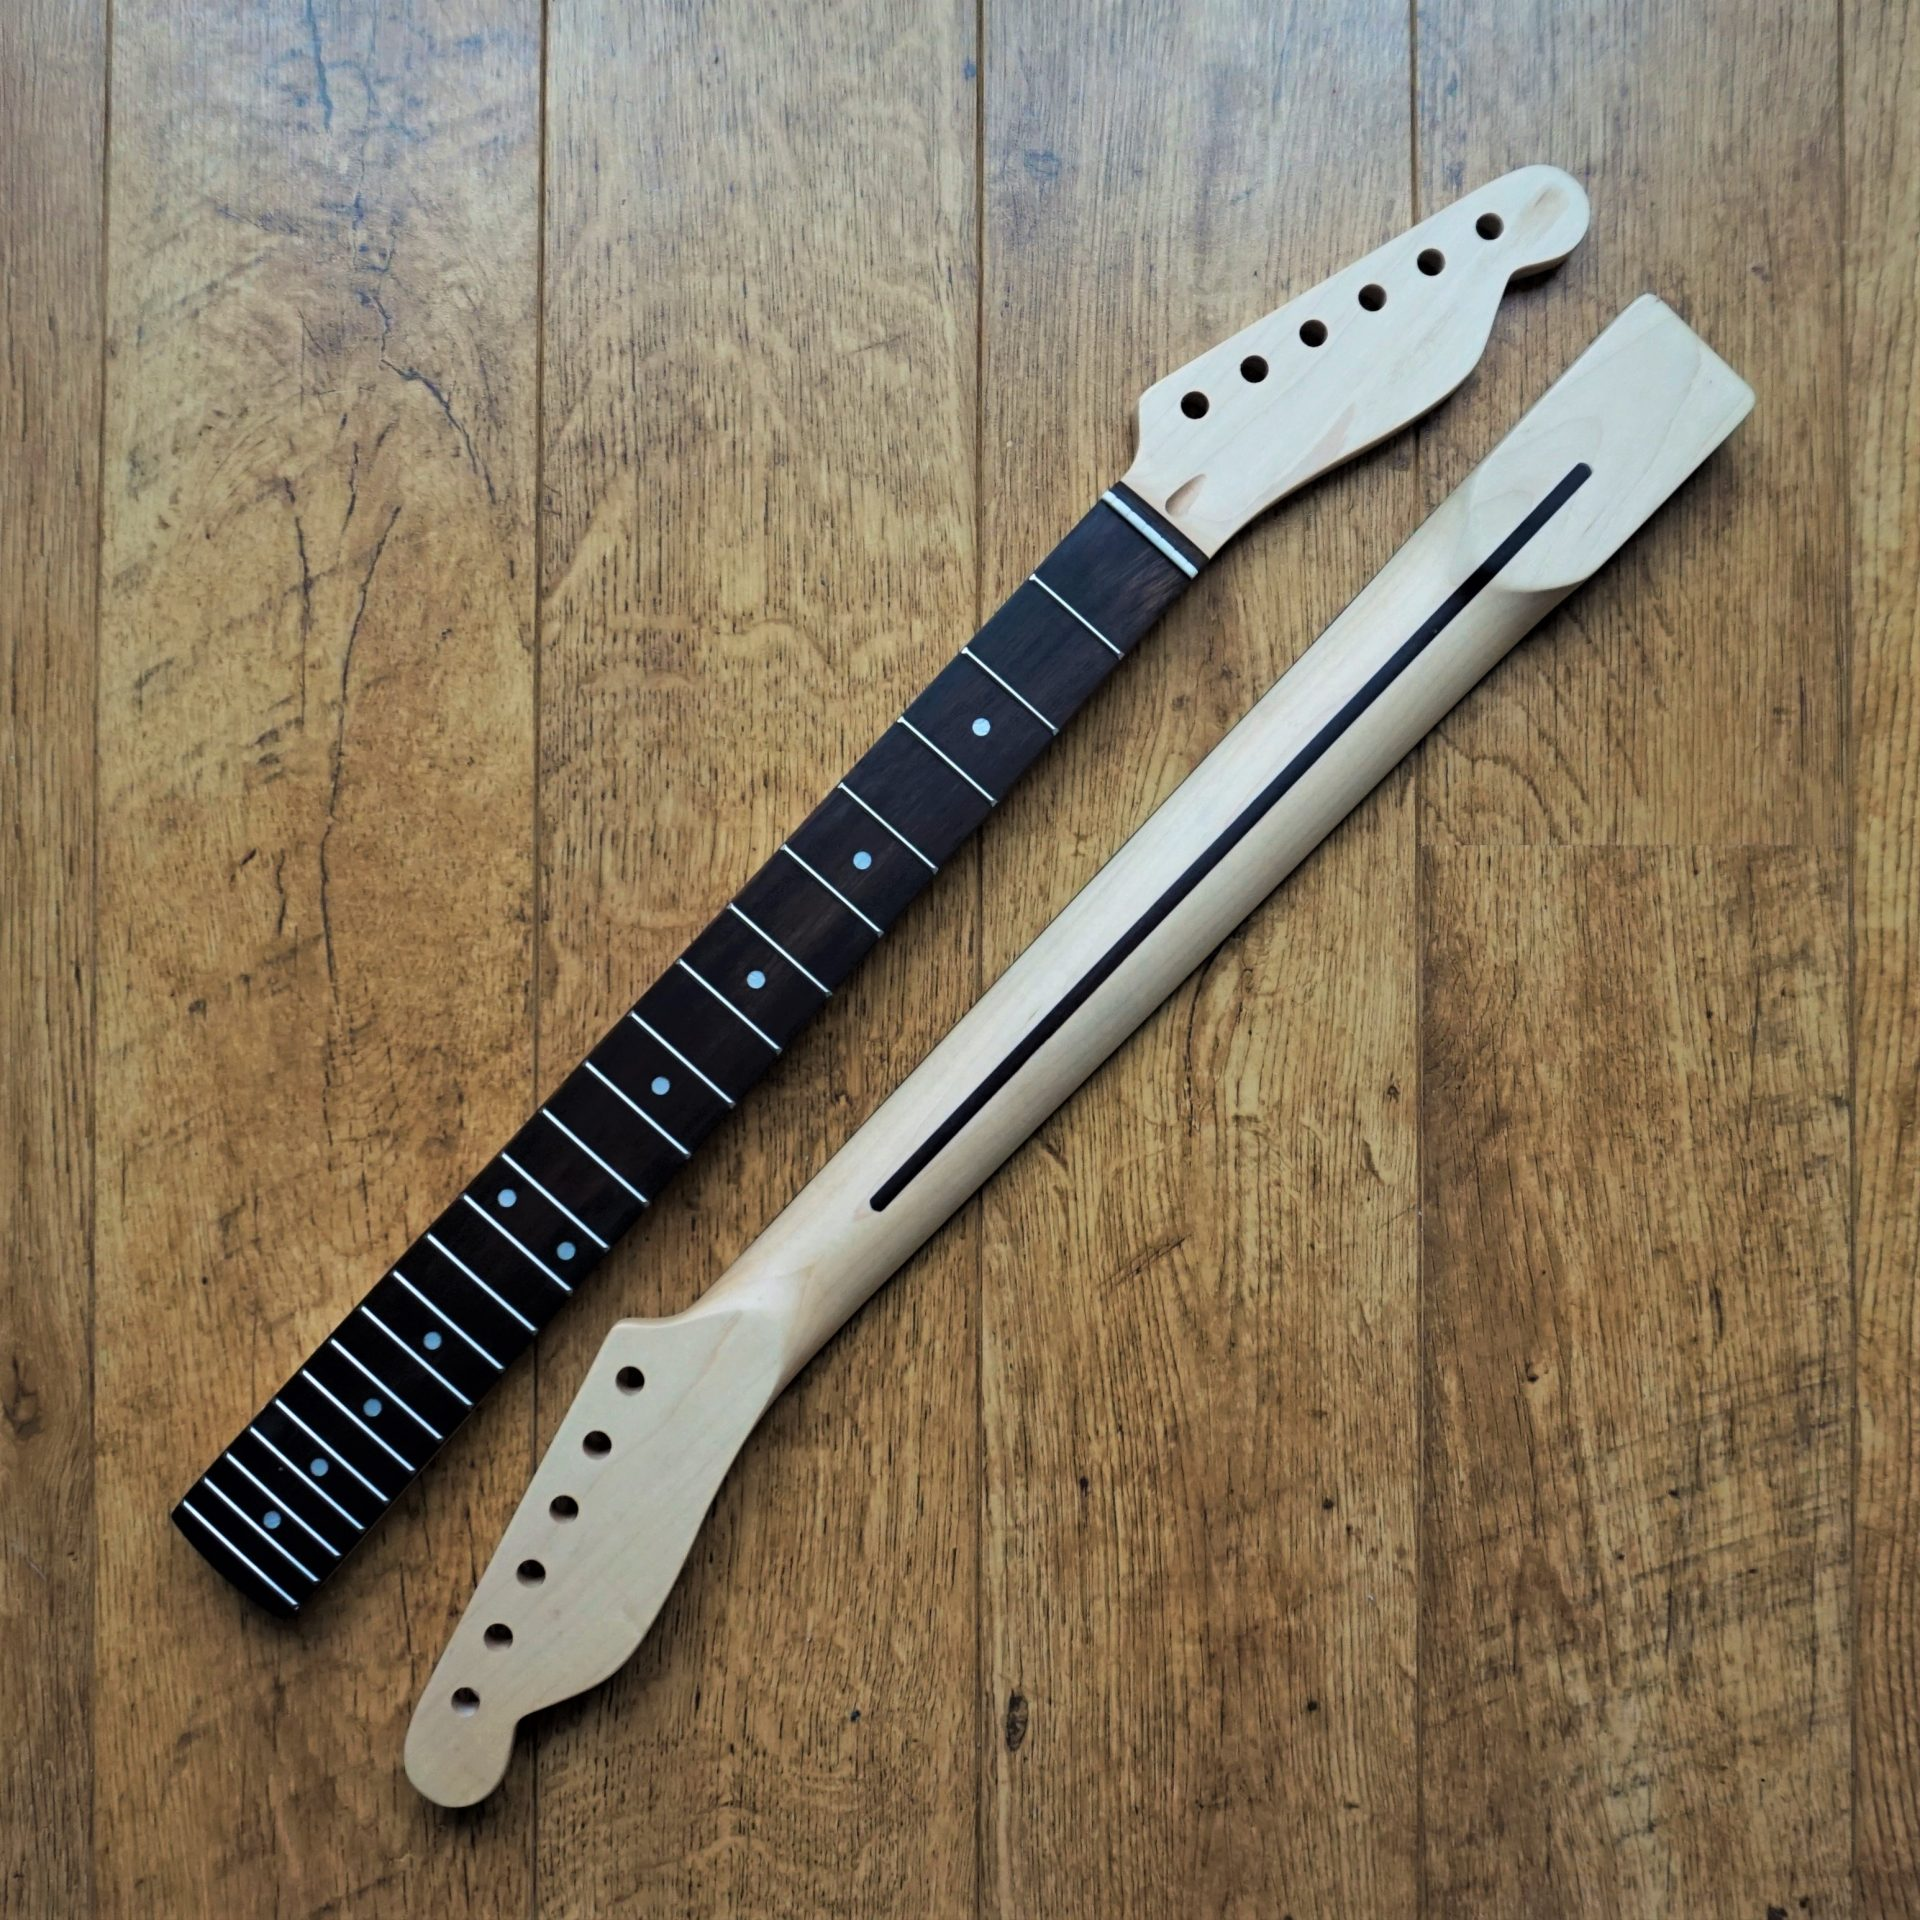 BUY Telecaster Guitar Neck Rosewood Fretboard   Guitar Anatomy